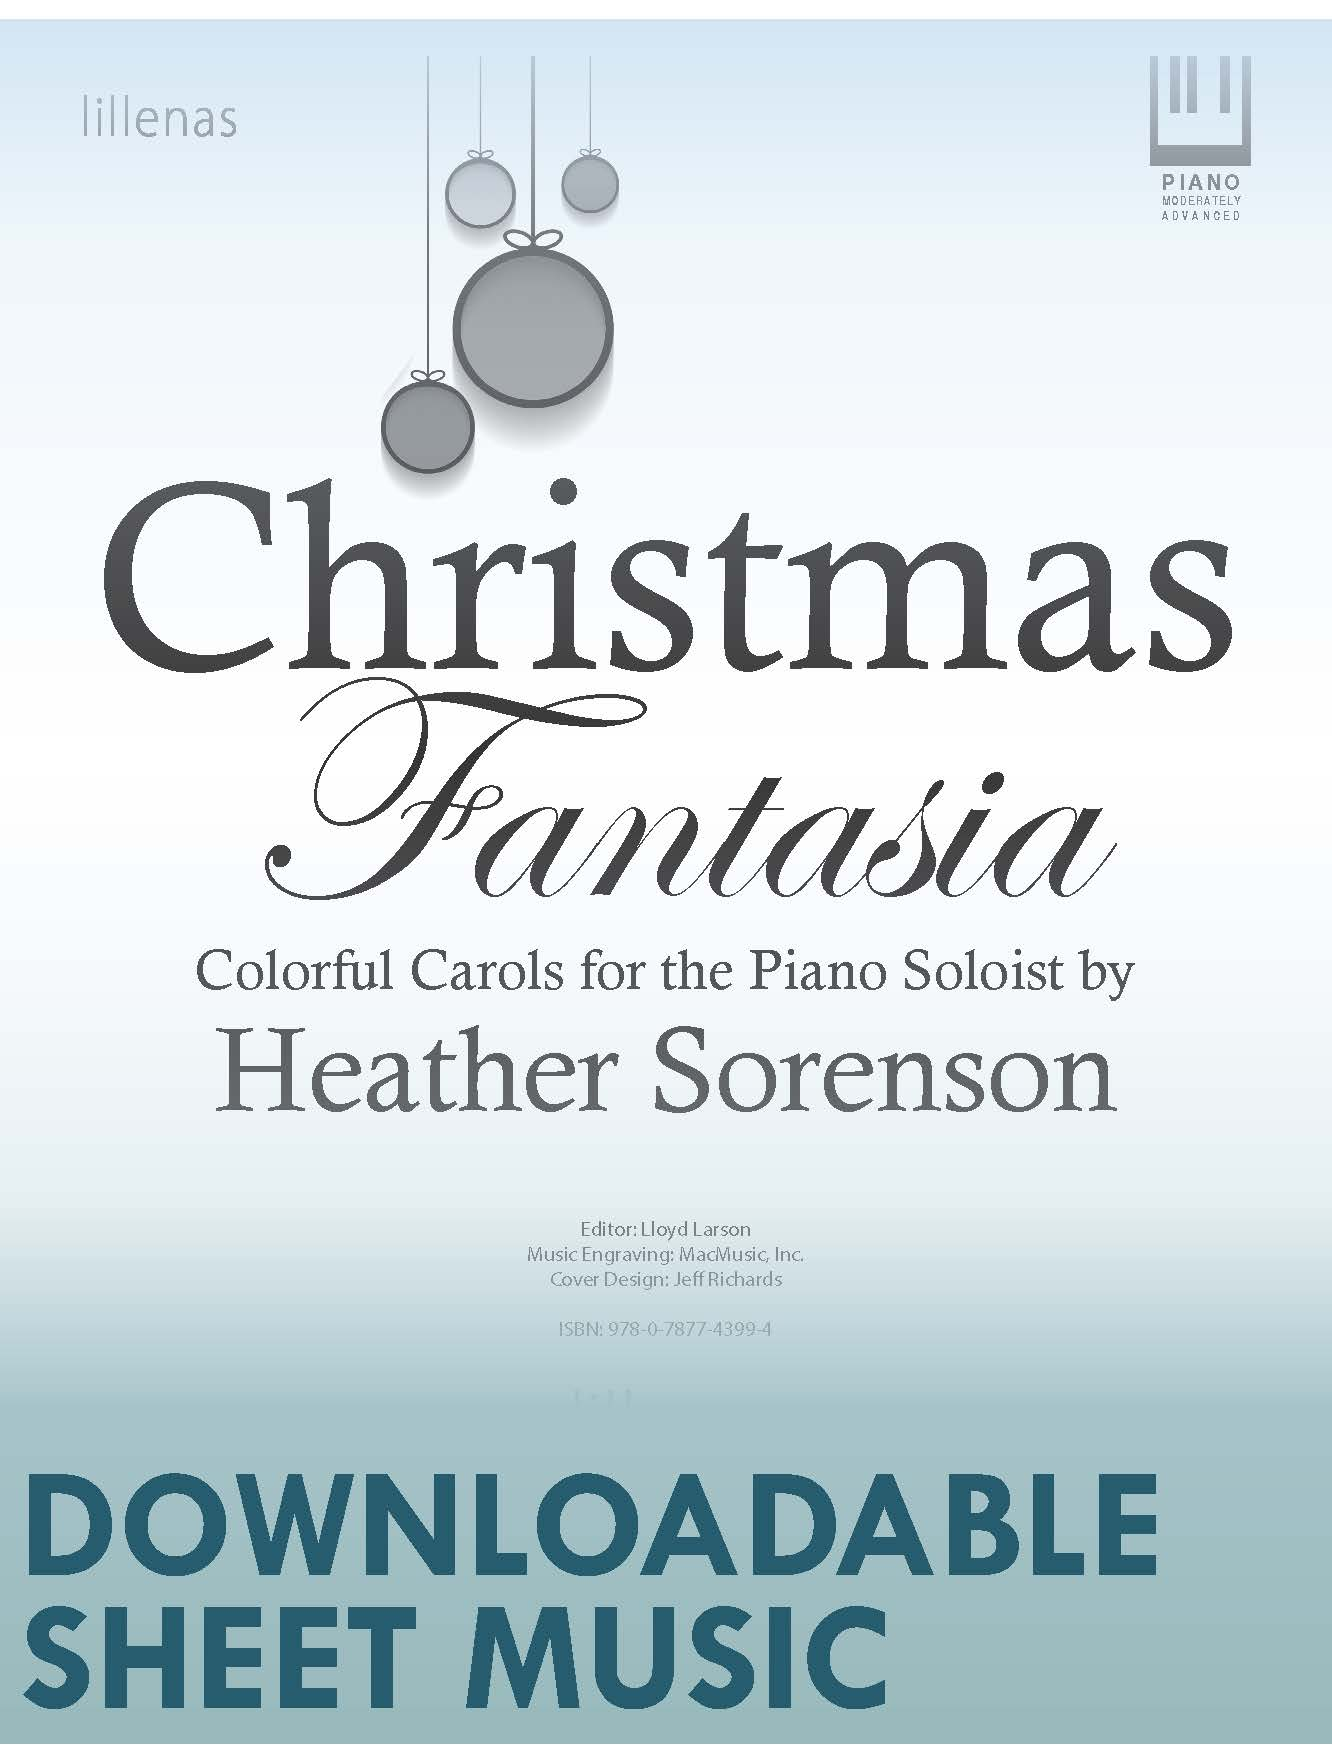 Christmas Music Downloadable.Christmas Fantasia Digital Download